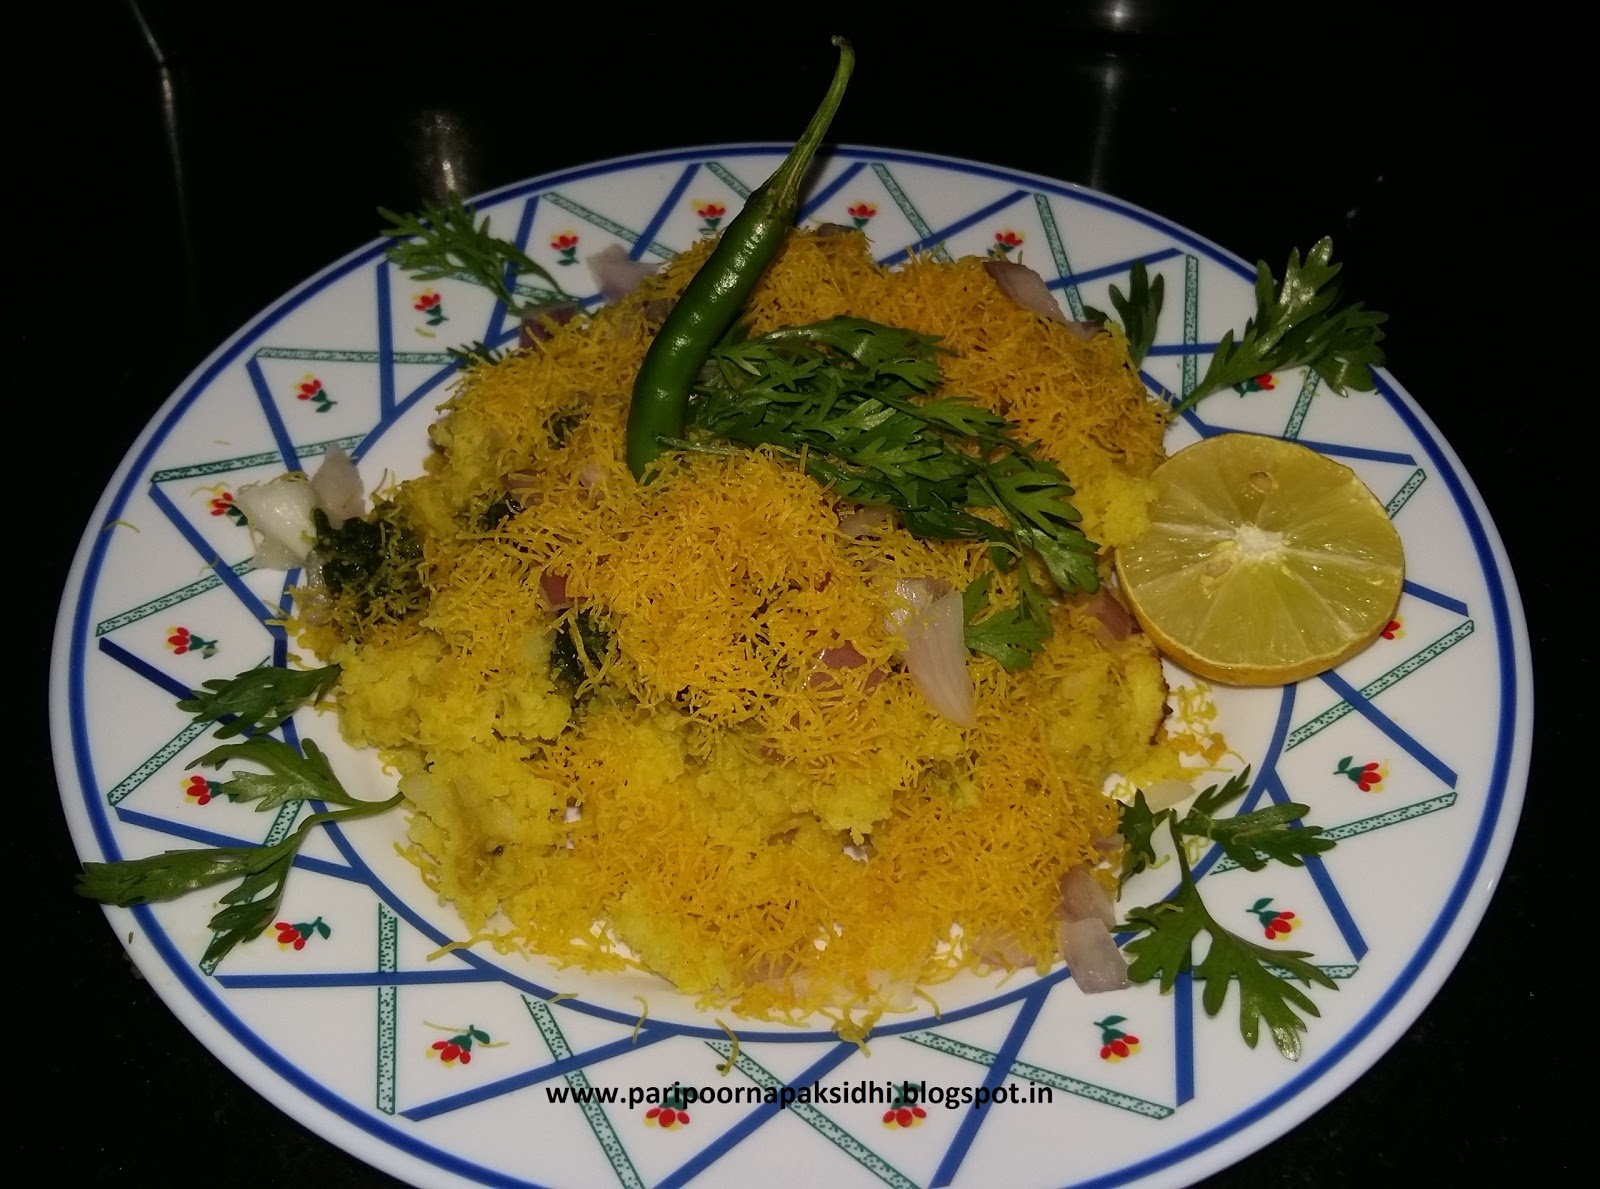 Various Cake Recipes In Marathi: Paripoorna Paksiddhi : SURTI LOCHO / SAVORY STEAMED CAKE